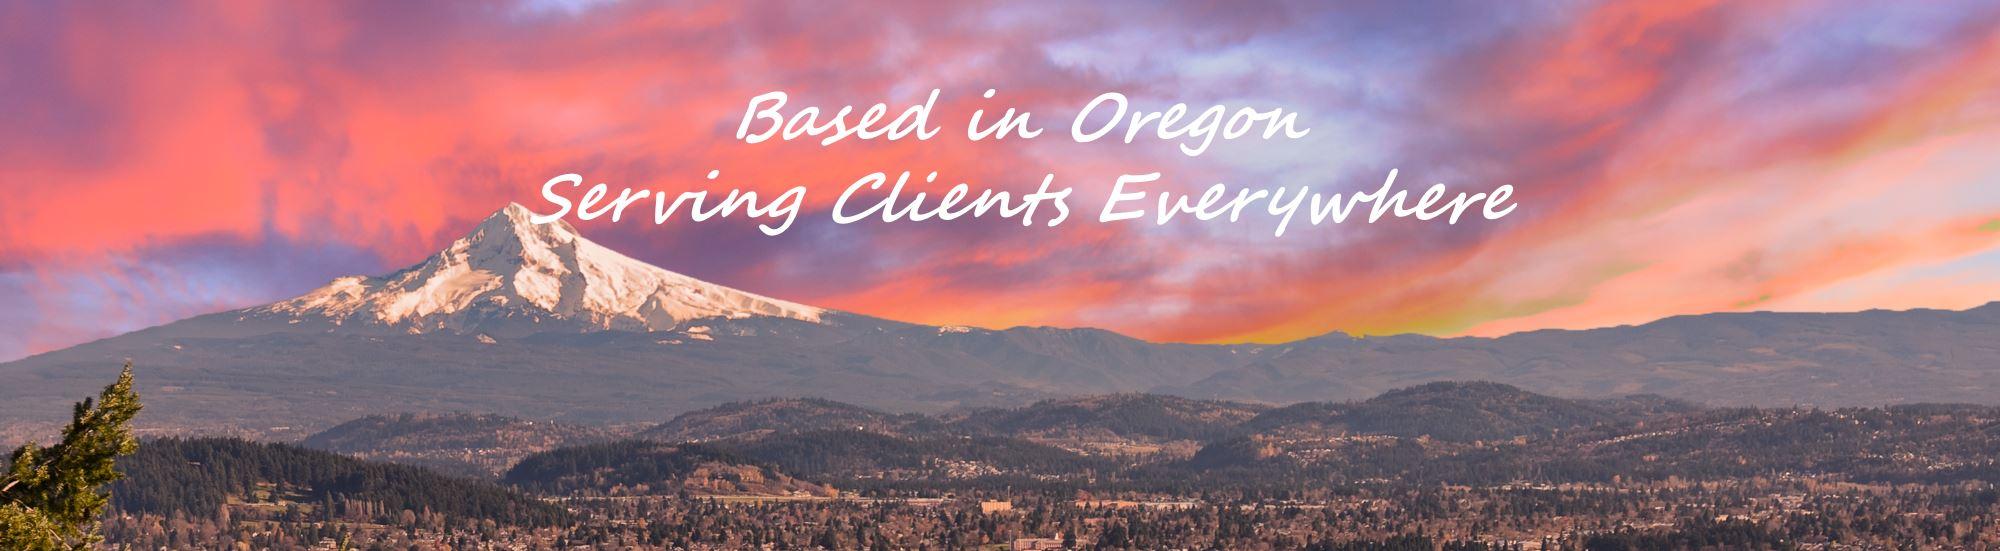 Portland web design and development